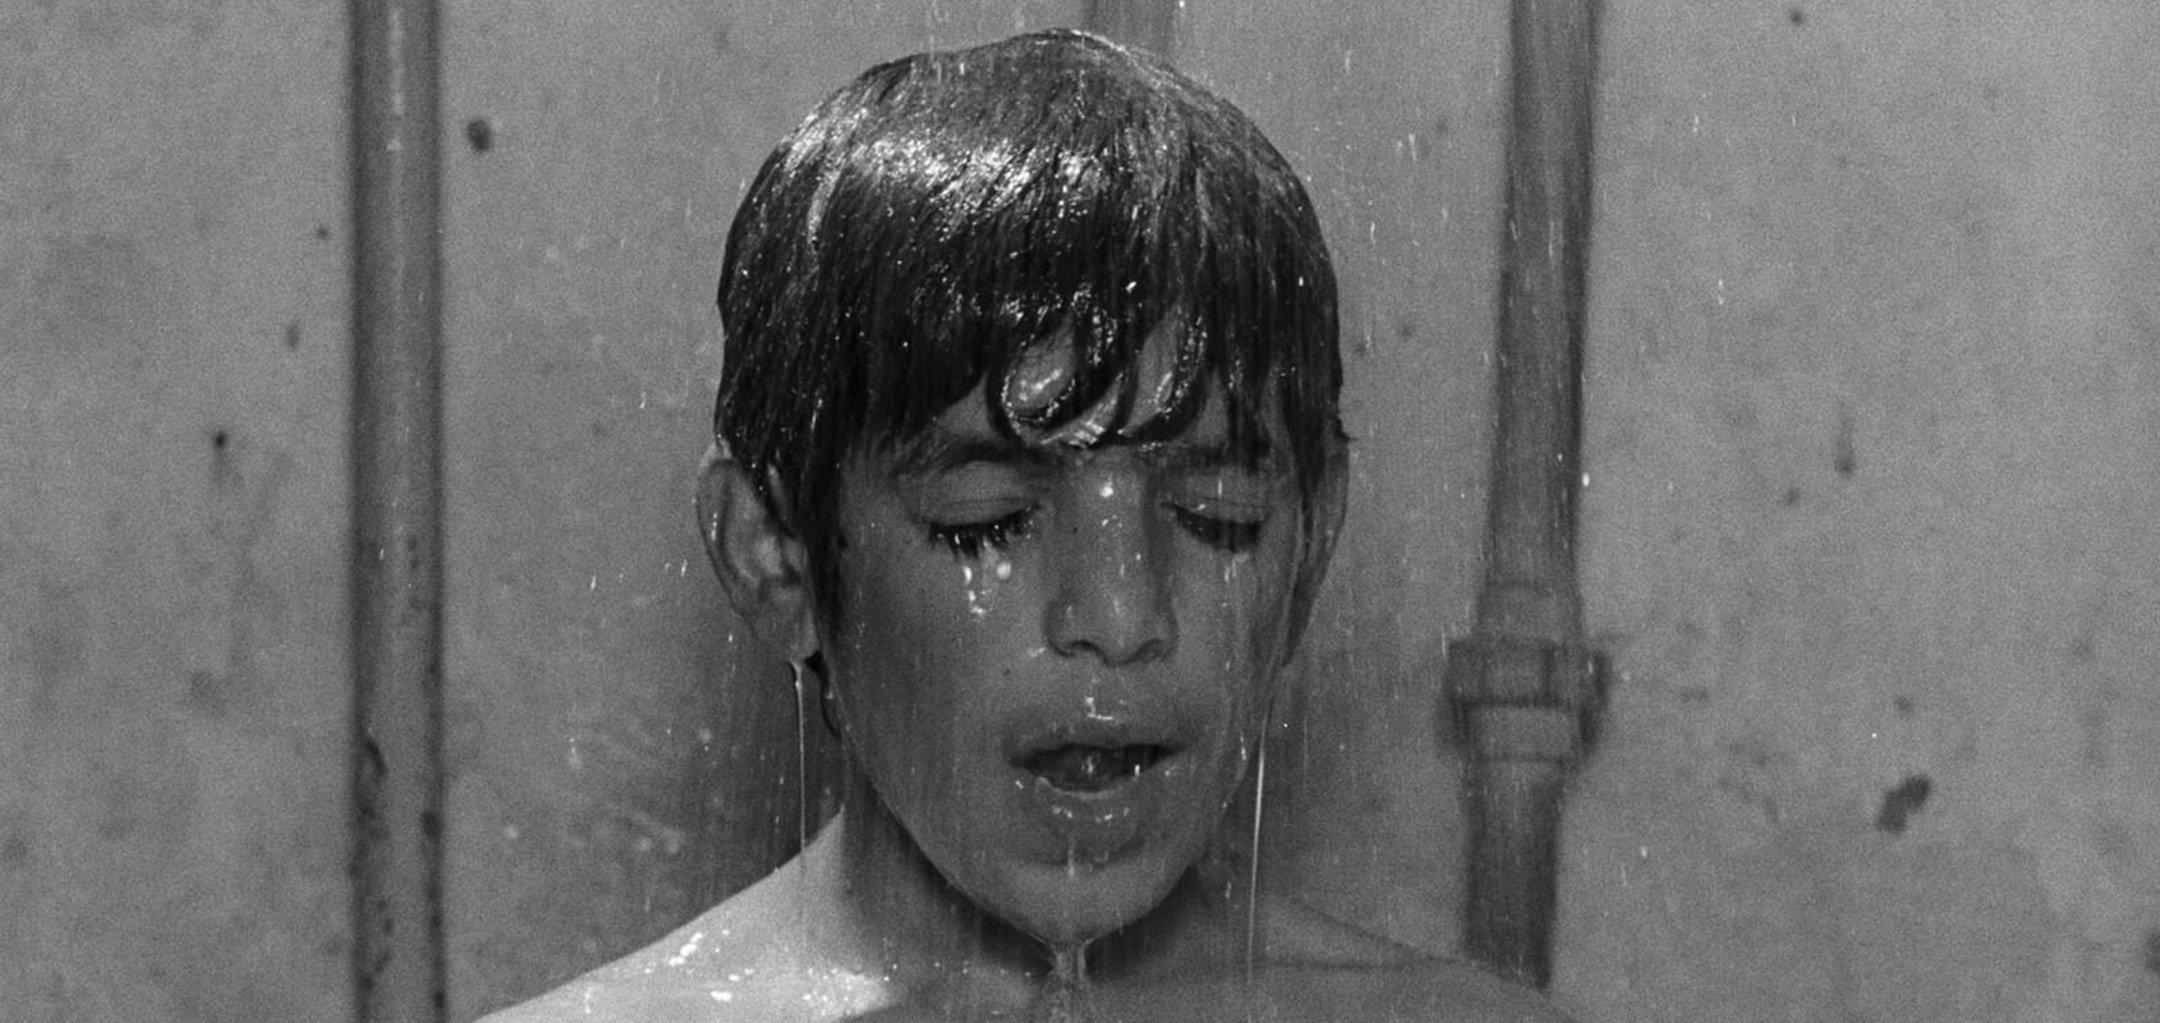 Hossein Yarmohammadi in Experience (1973)